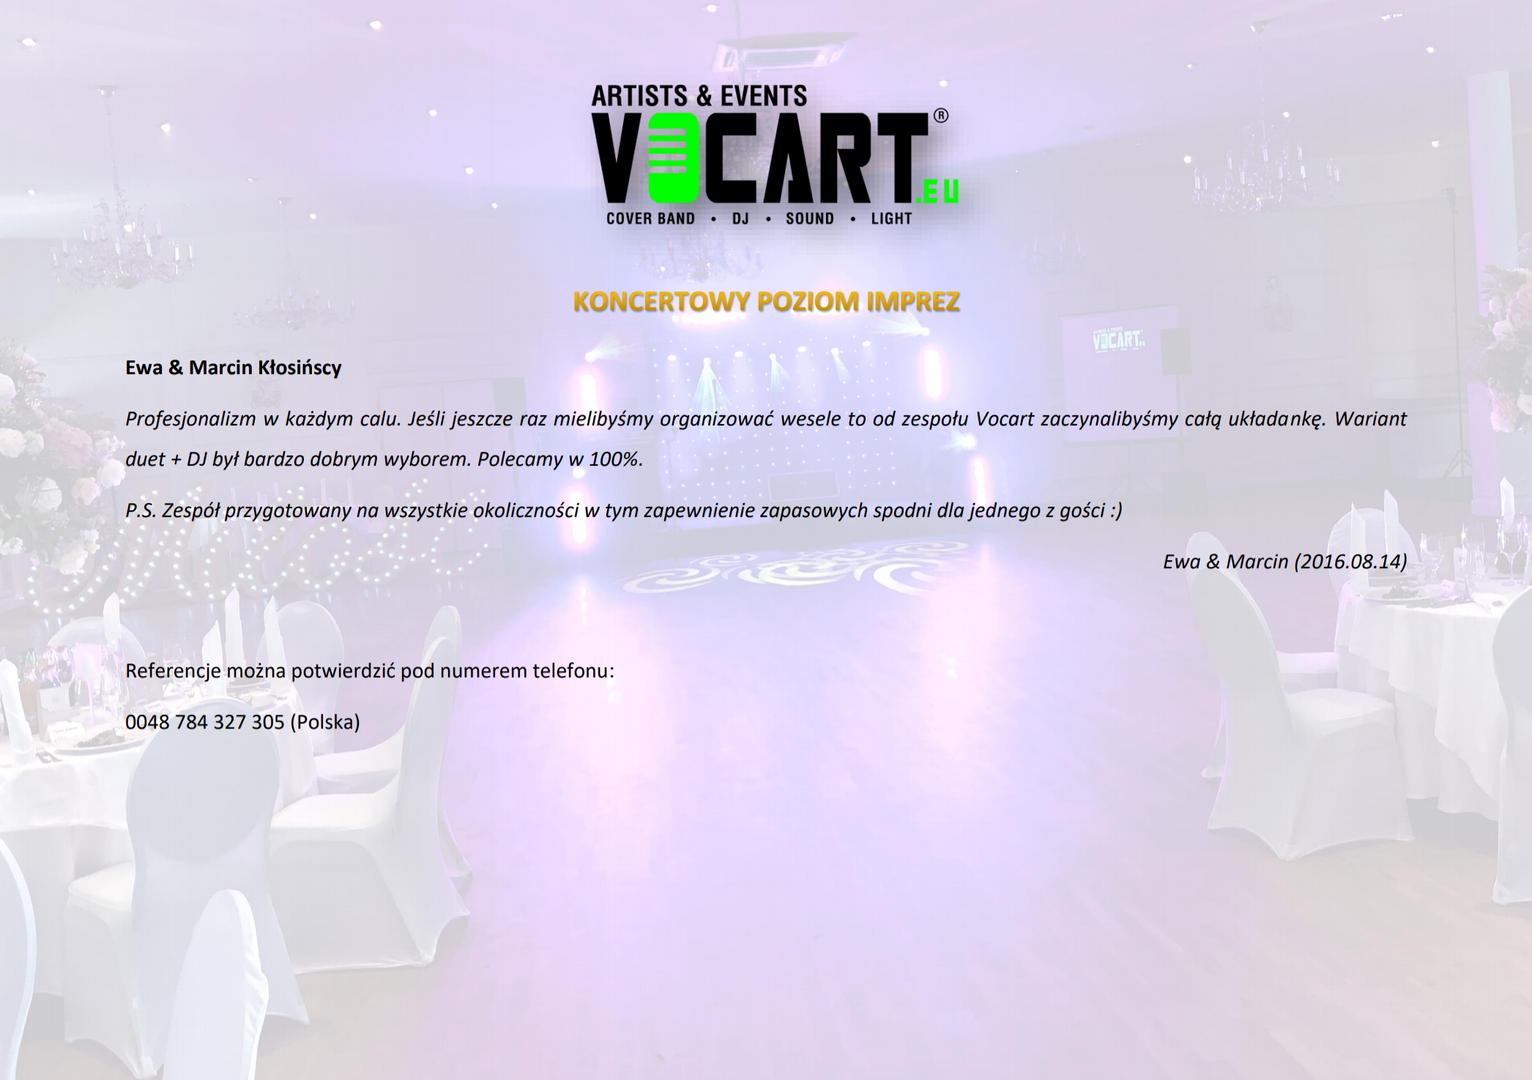 VOCART - Referencje - 2016.08.14 - Ewa &